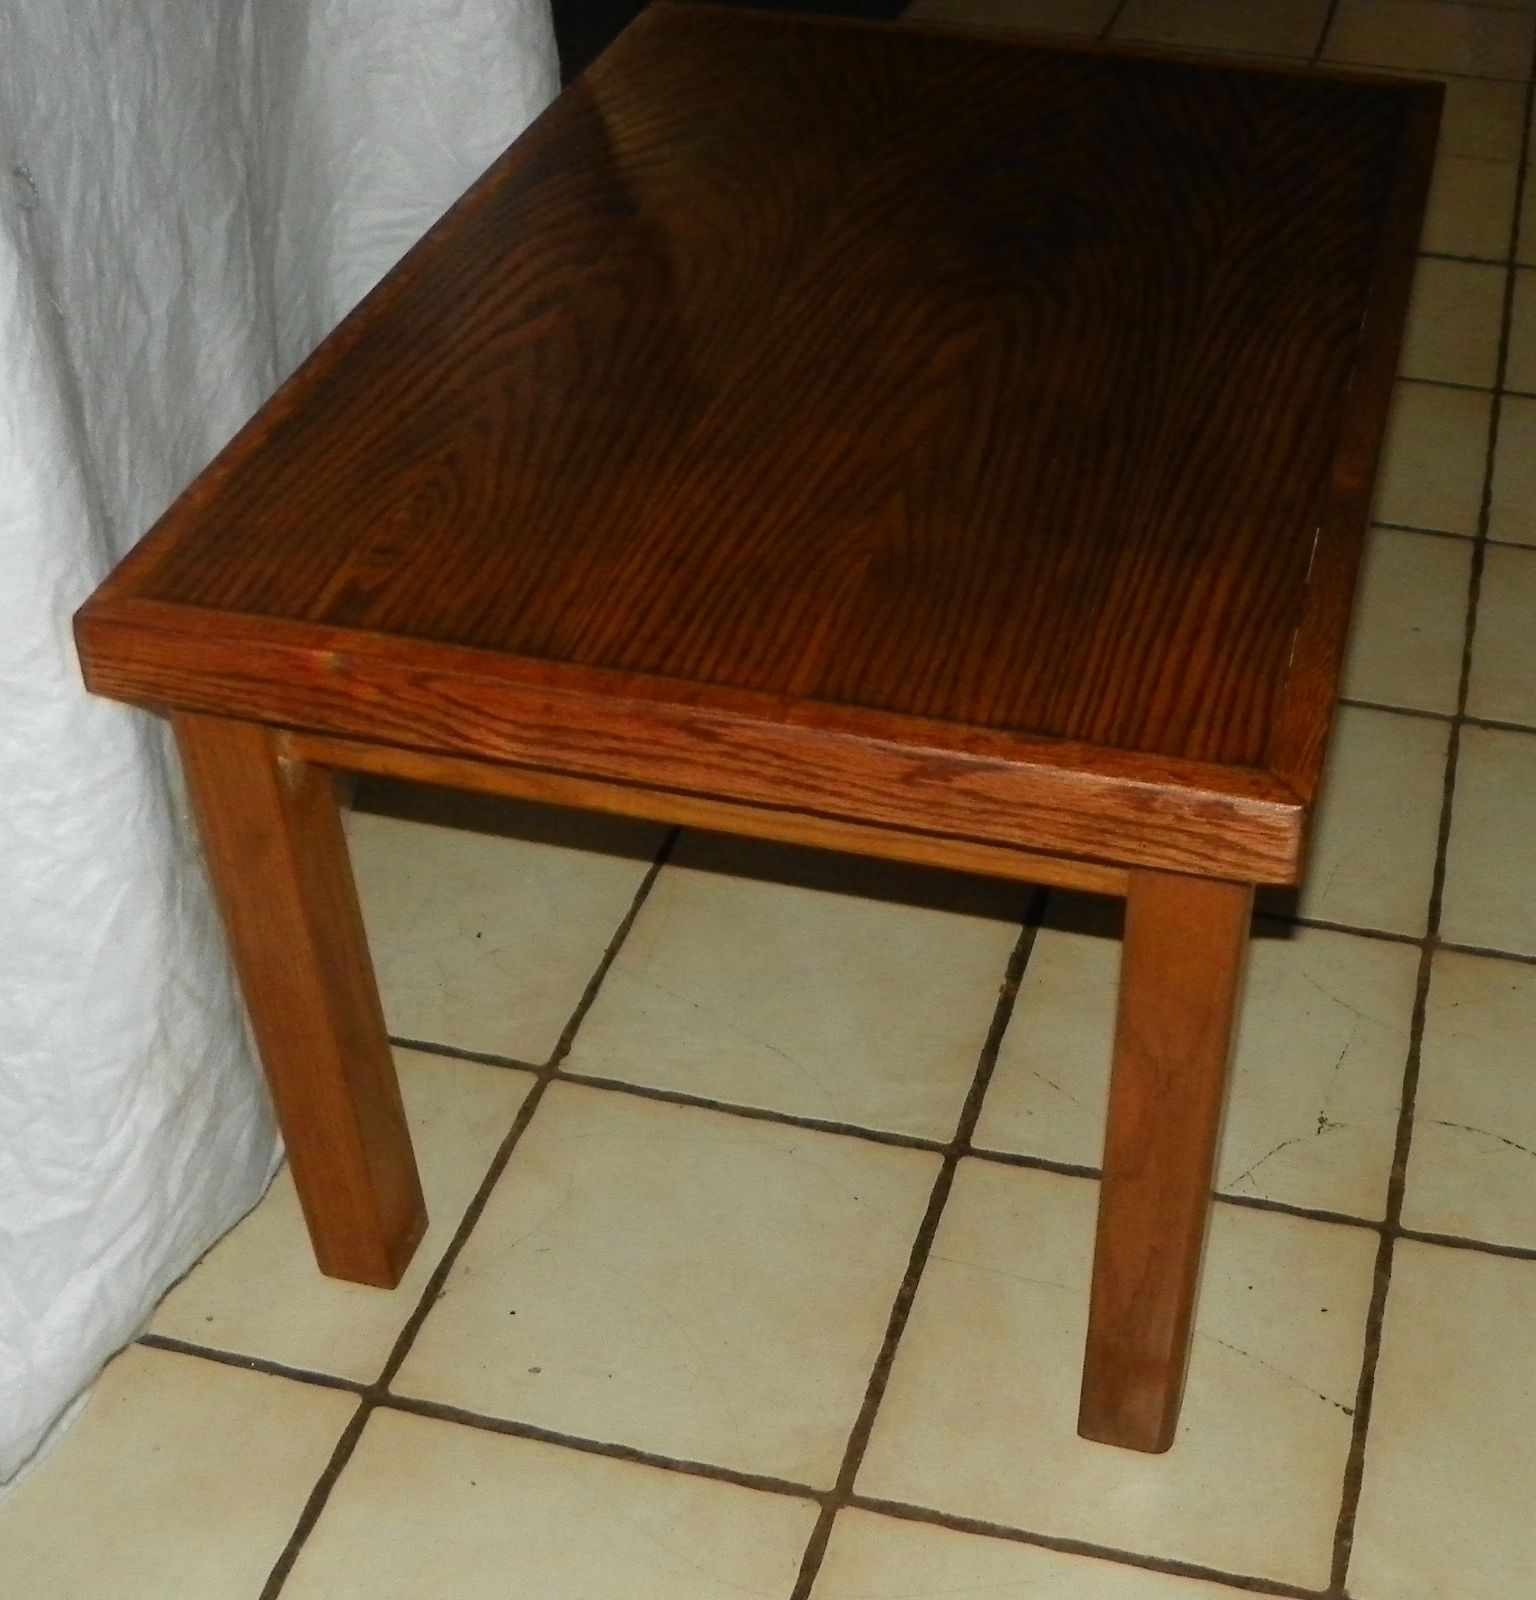 Mission Book Match Veneer Top Oak Coffee Table Ct21 Post 1950